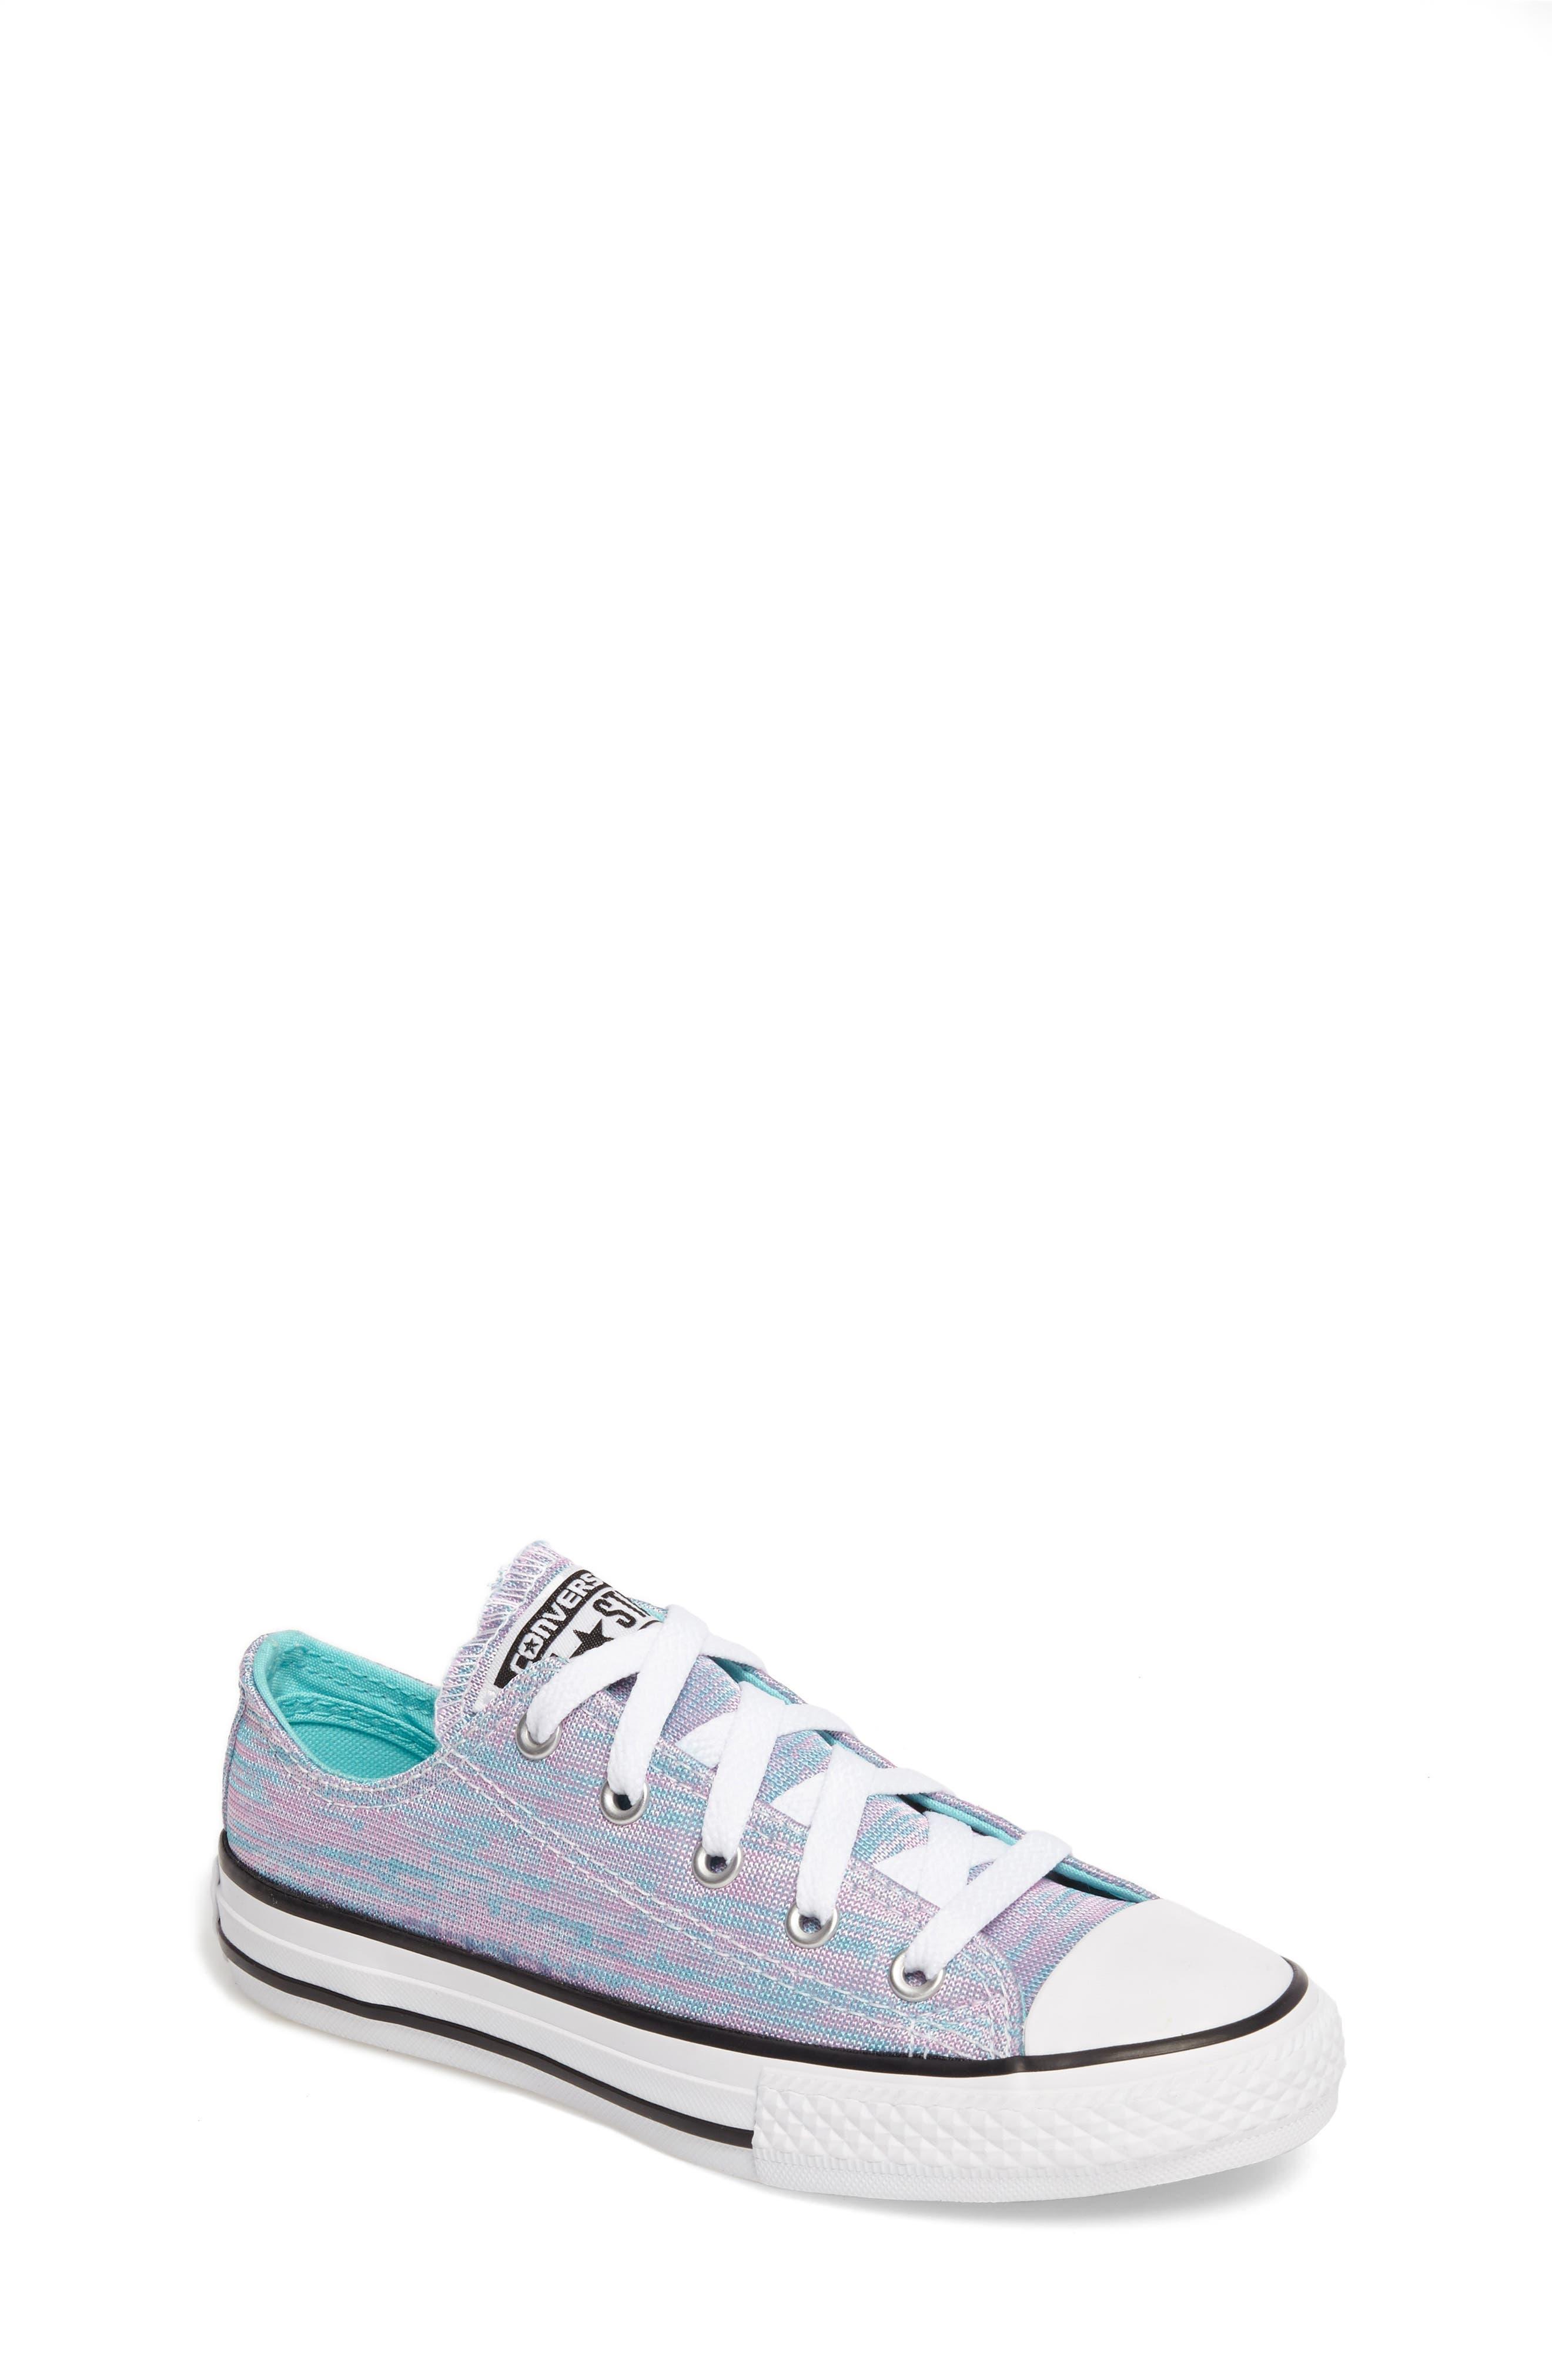 Converse All Star® Jersey Knit Low-Top Sneaker (Toddler & Little Kid)